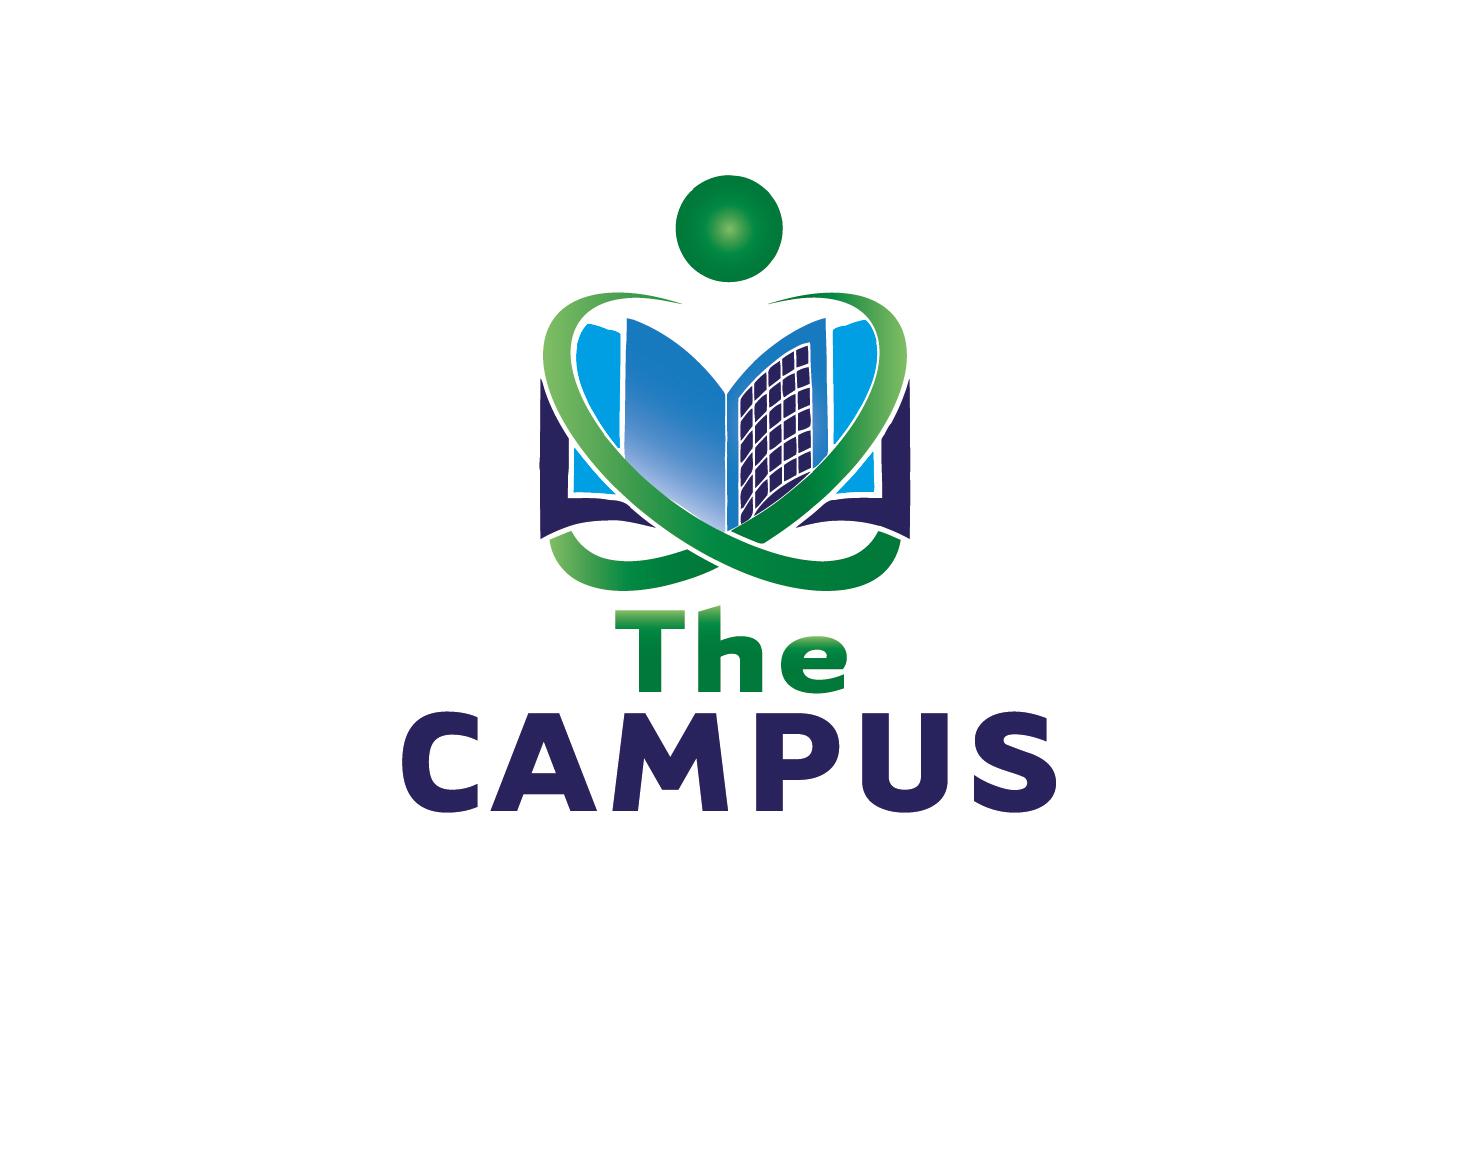 Logo Design by VENTSISLAV KOVACHEV - Entry No. 88 in the Logo Design Contest theCampus Logo Design.